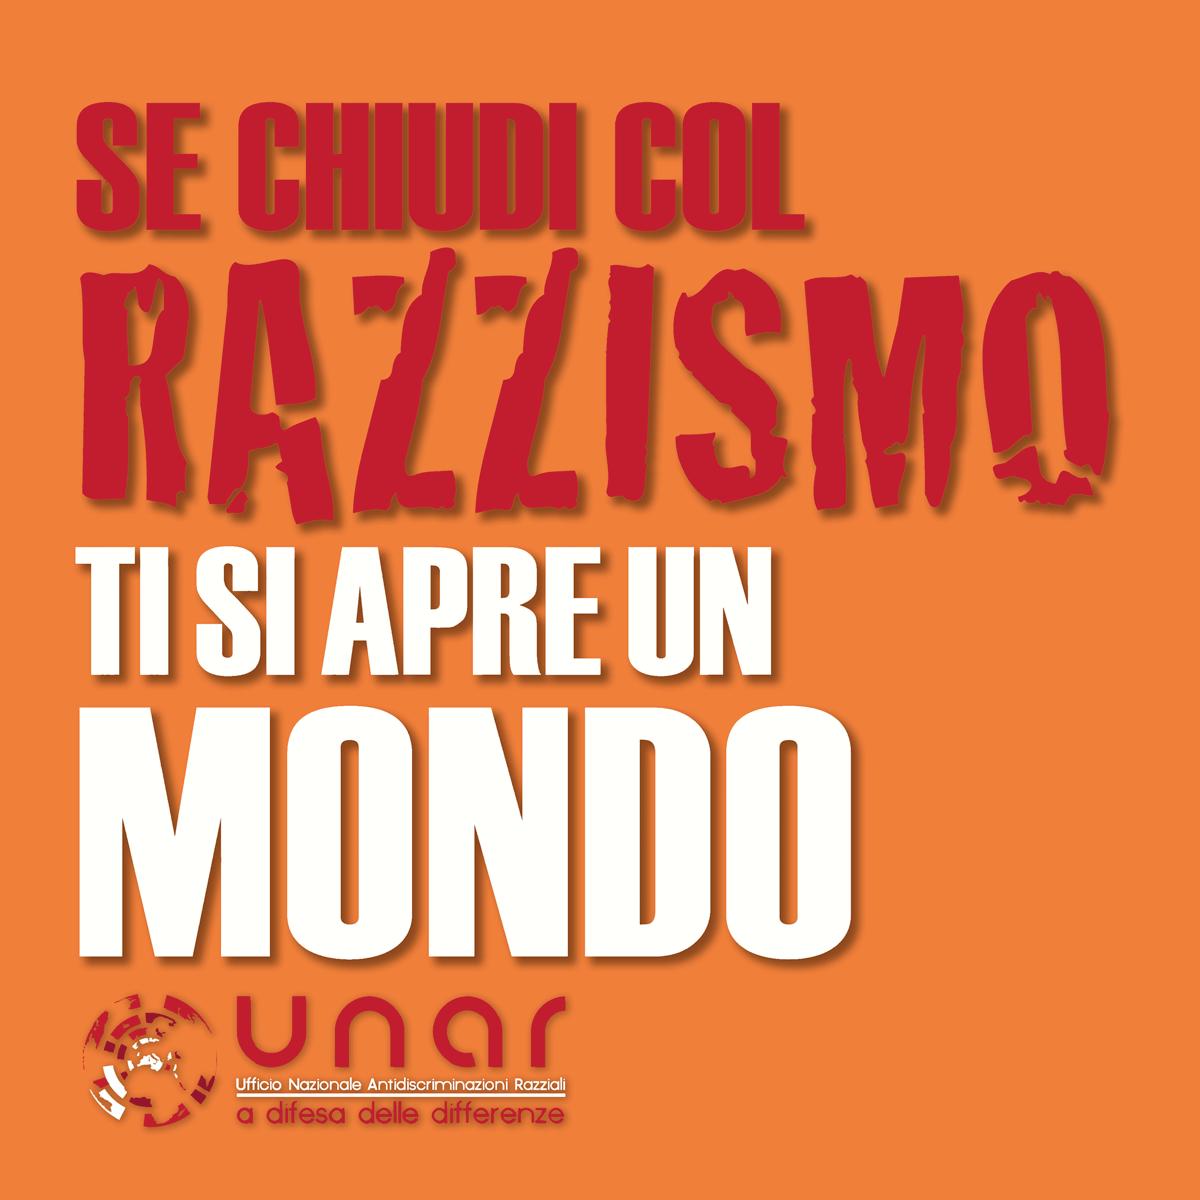 CALL FOR ENTRIES! Cercasi Partecipanti per Mostra ad Udine